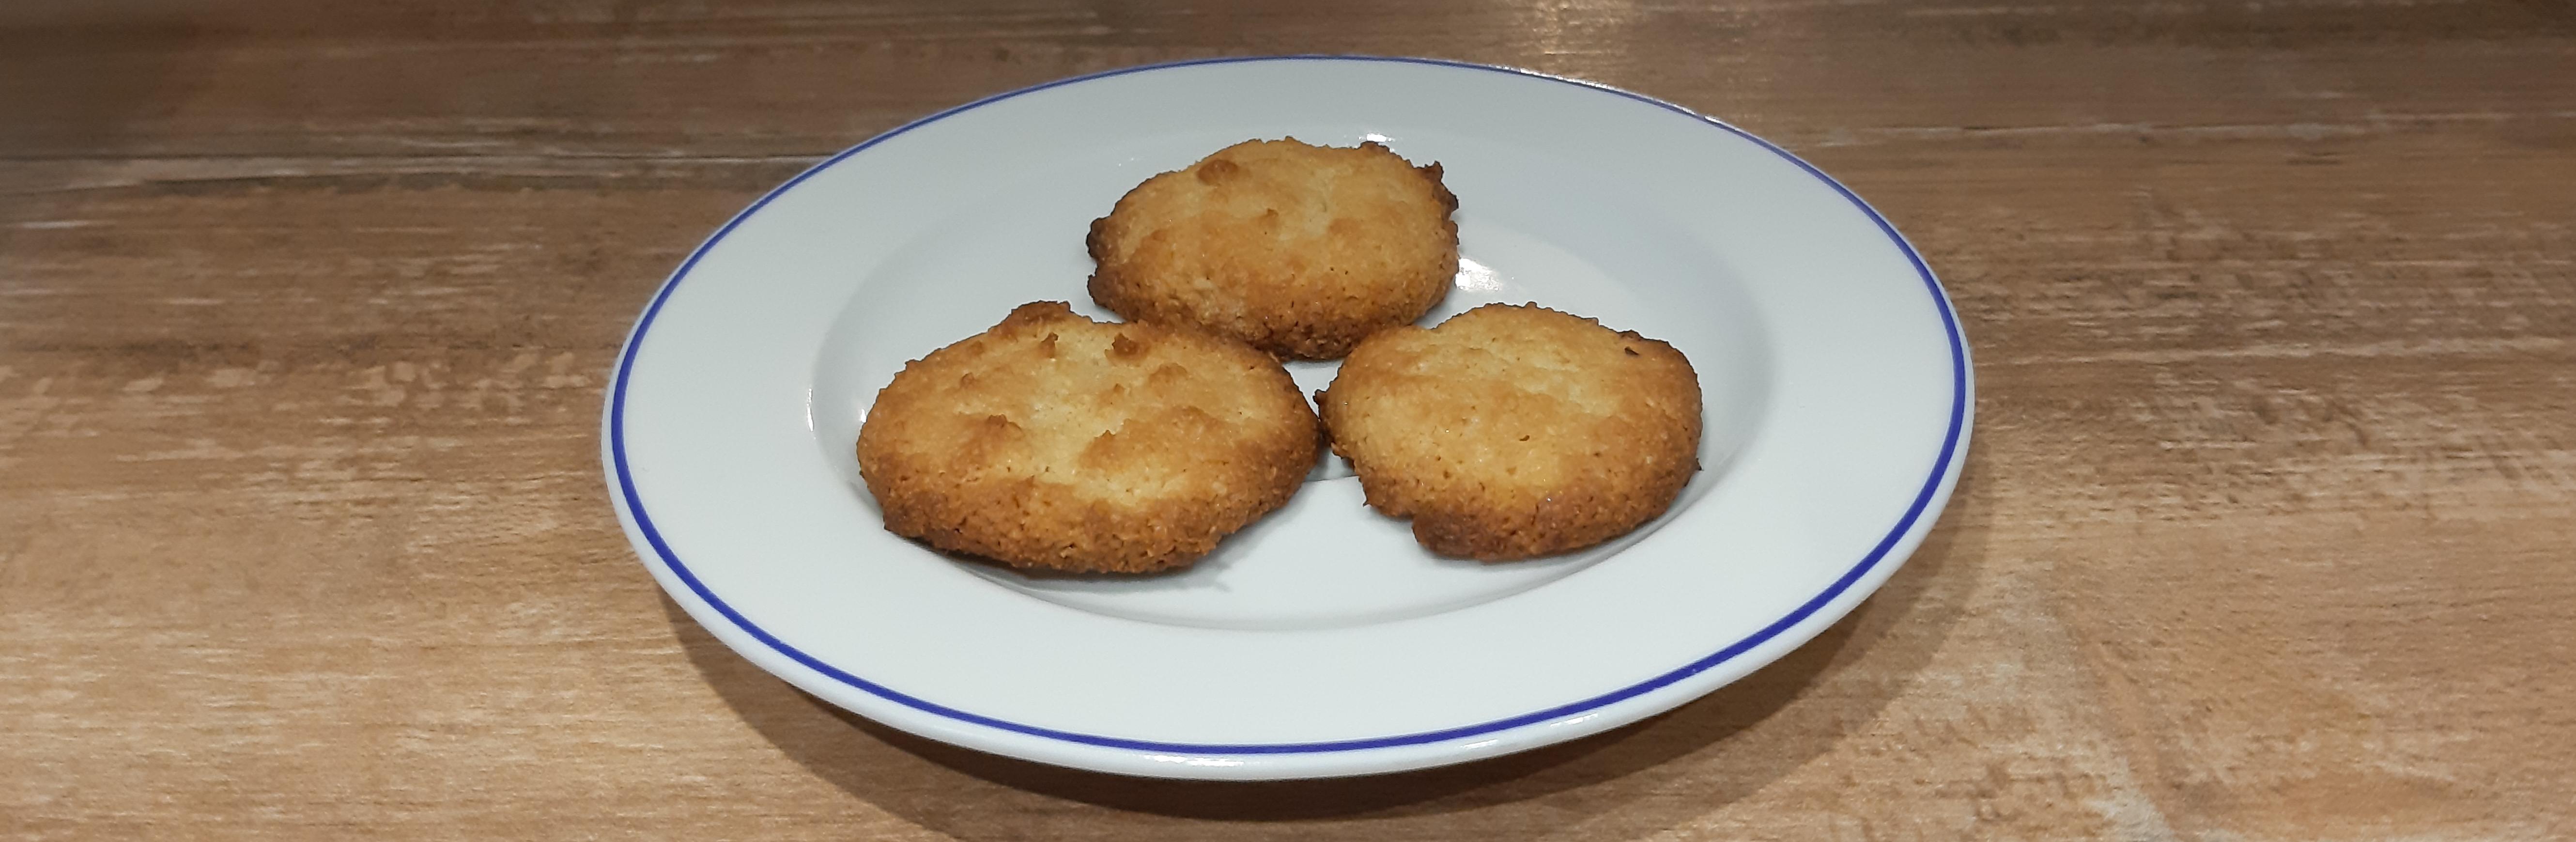 Low carb christmas cookies: Lemon bites recipe